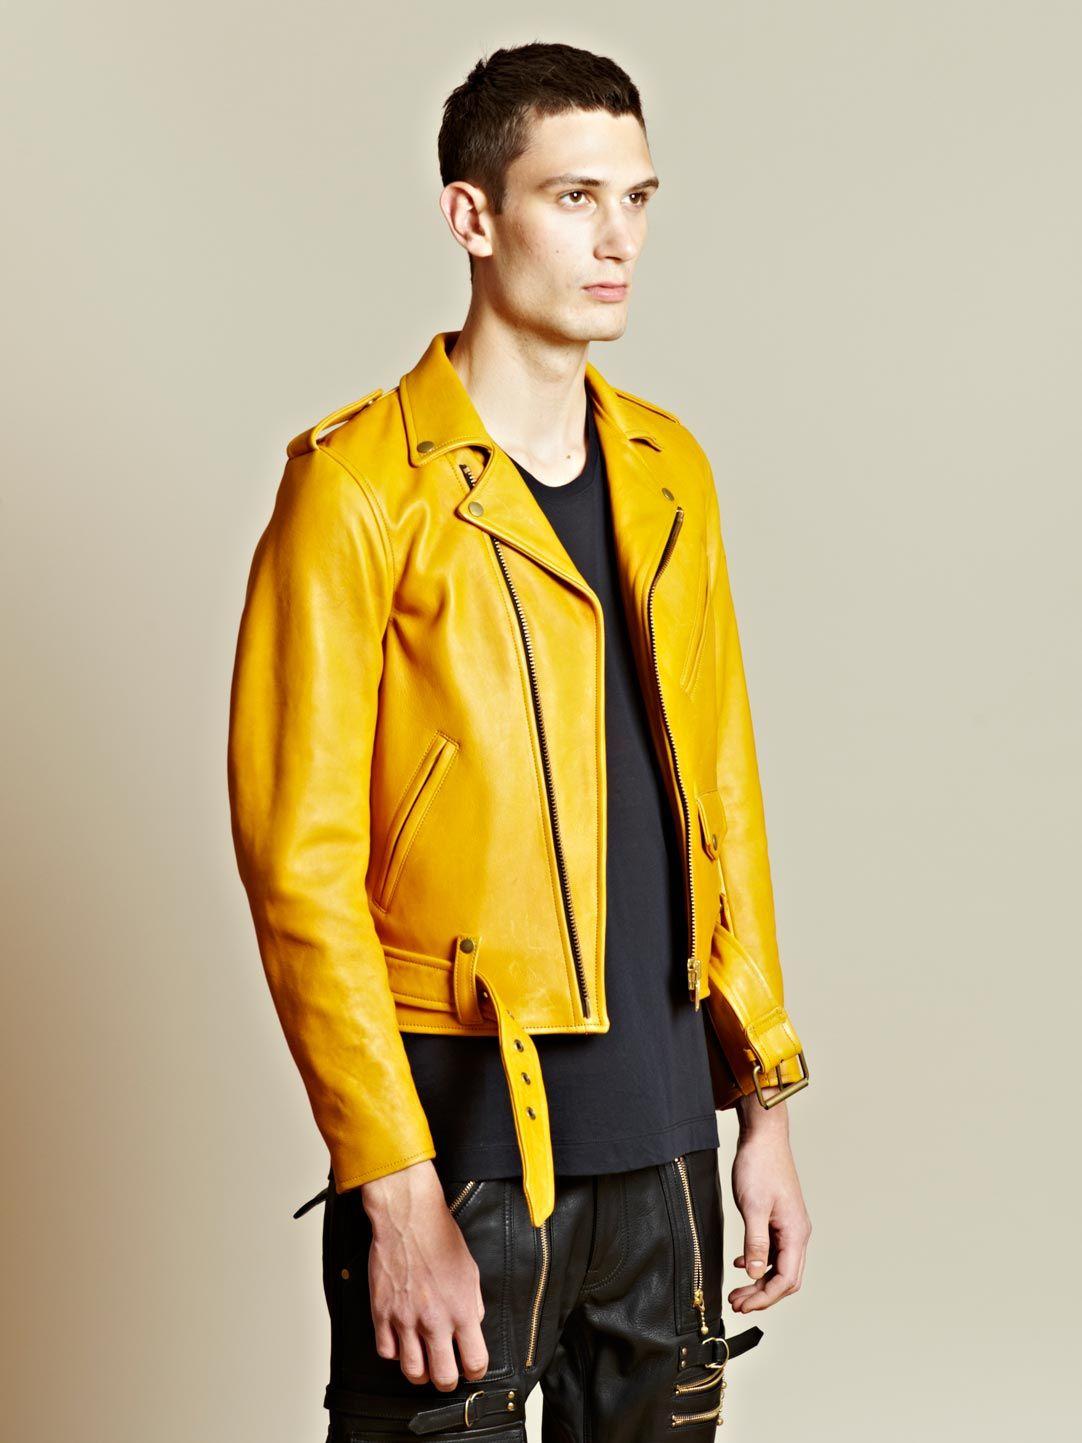 Blackmeans Men's Biker Leather Jacket Leather jacket